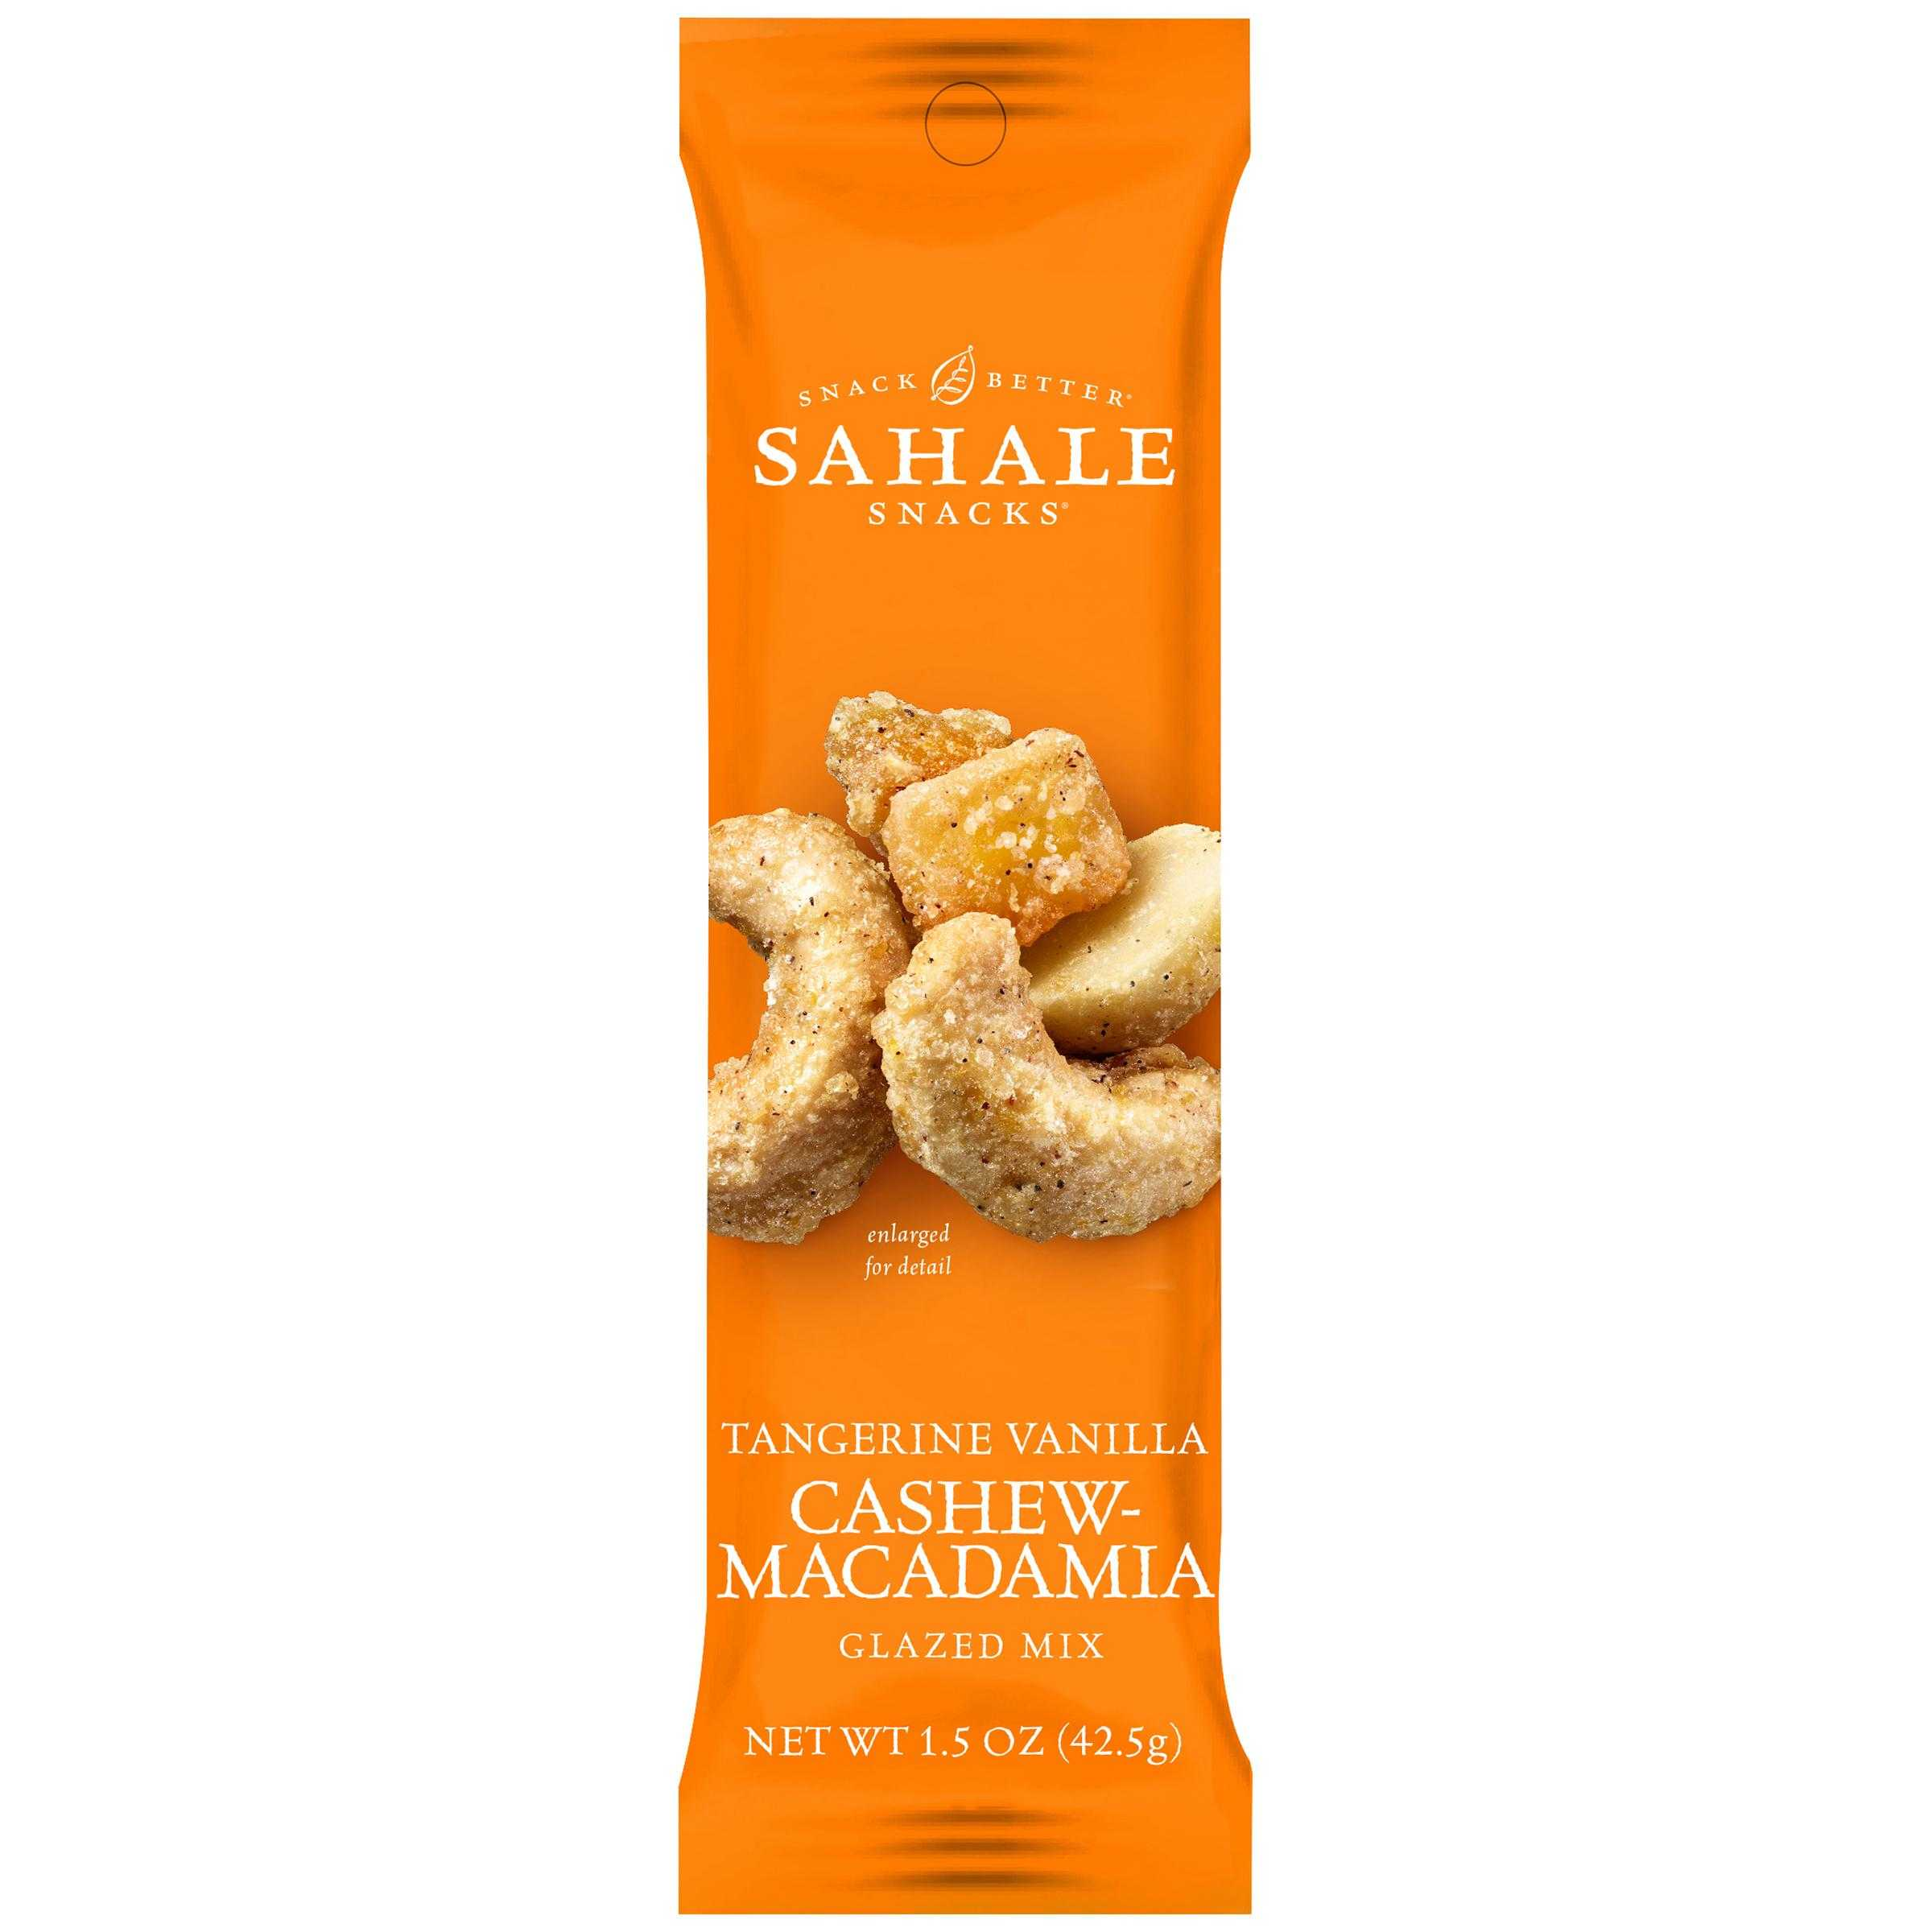 Sahale 1 5 Ounce Tangerine Vanilla Cashew Macadamia Glazed